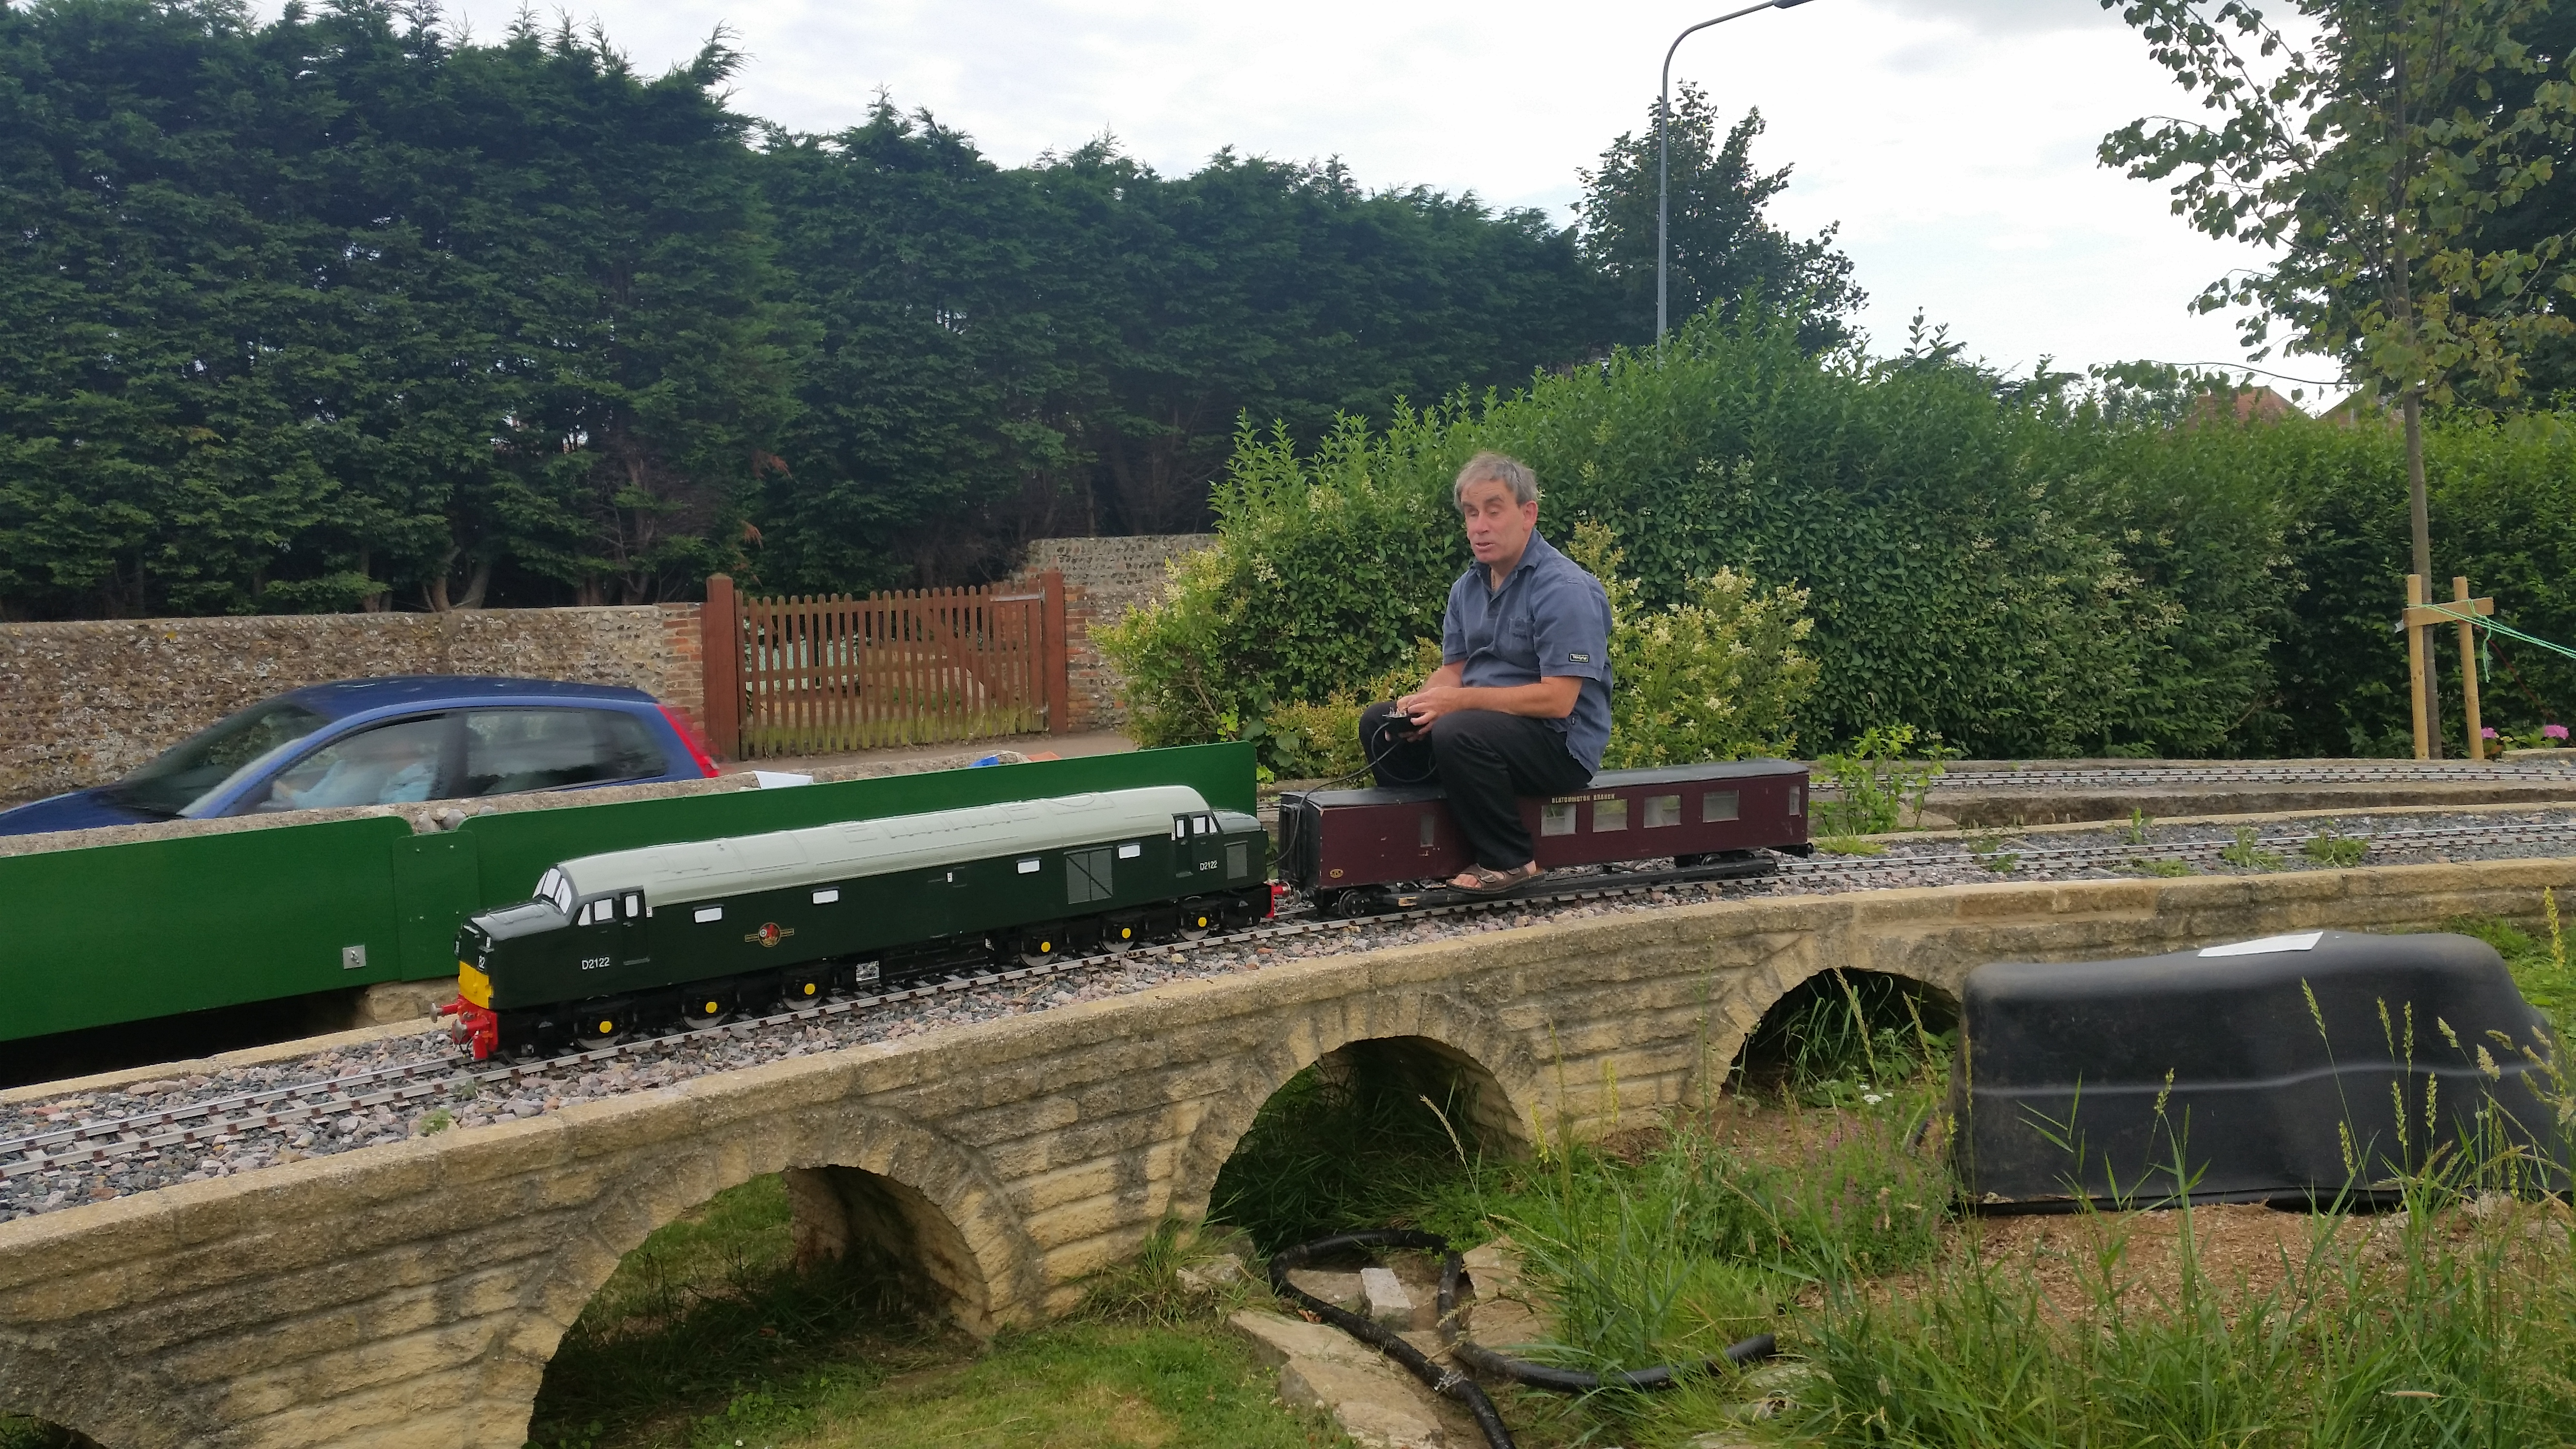 The Blatchington branch garden railway - Locomotives